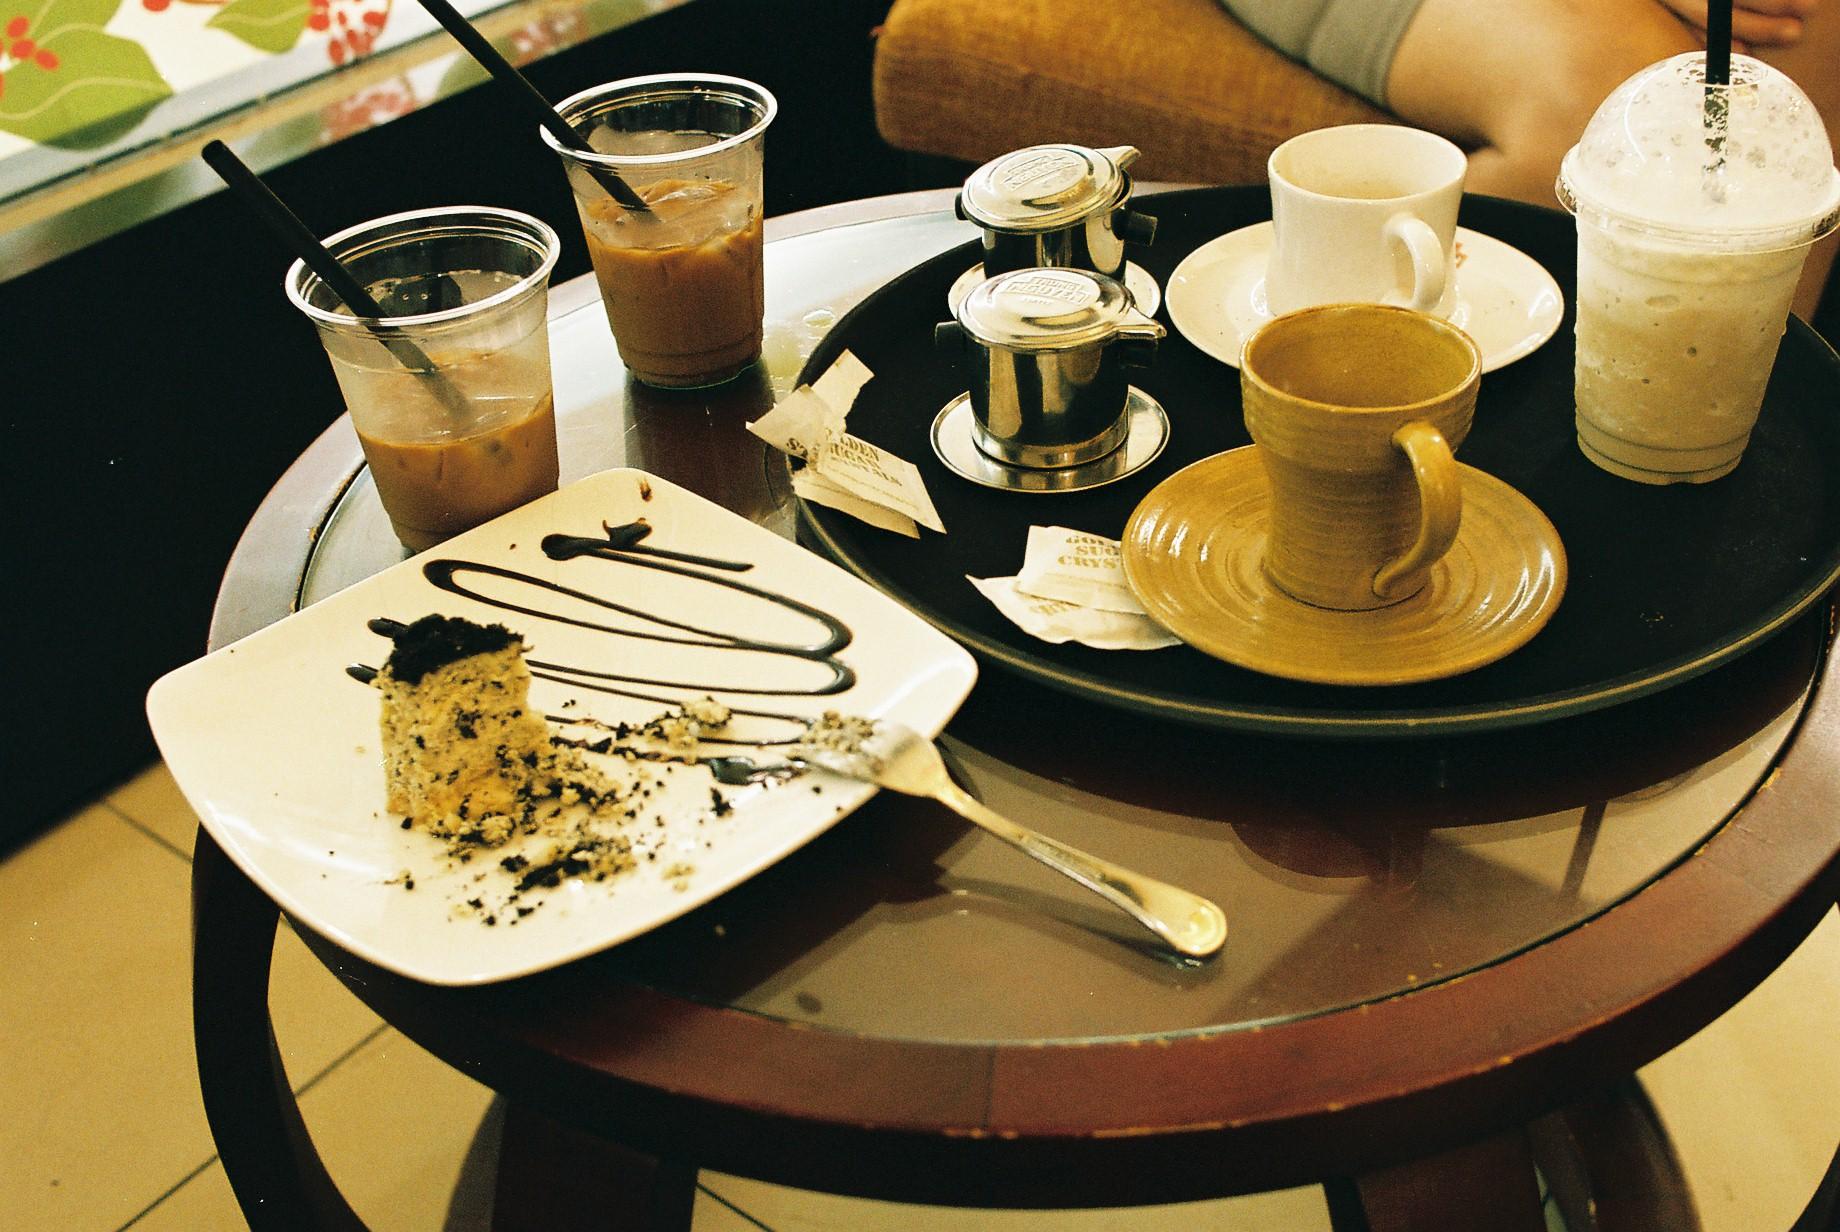 Vietnamese coffee and Oreo cheesecake